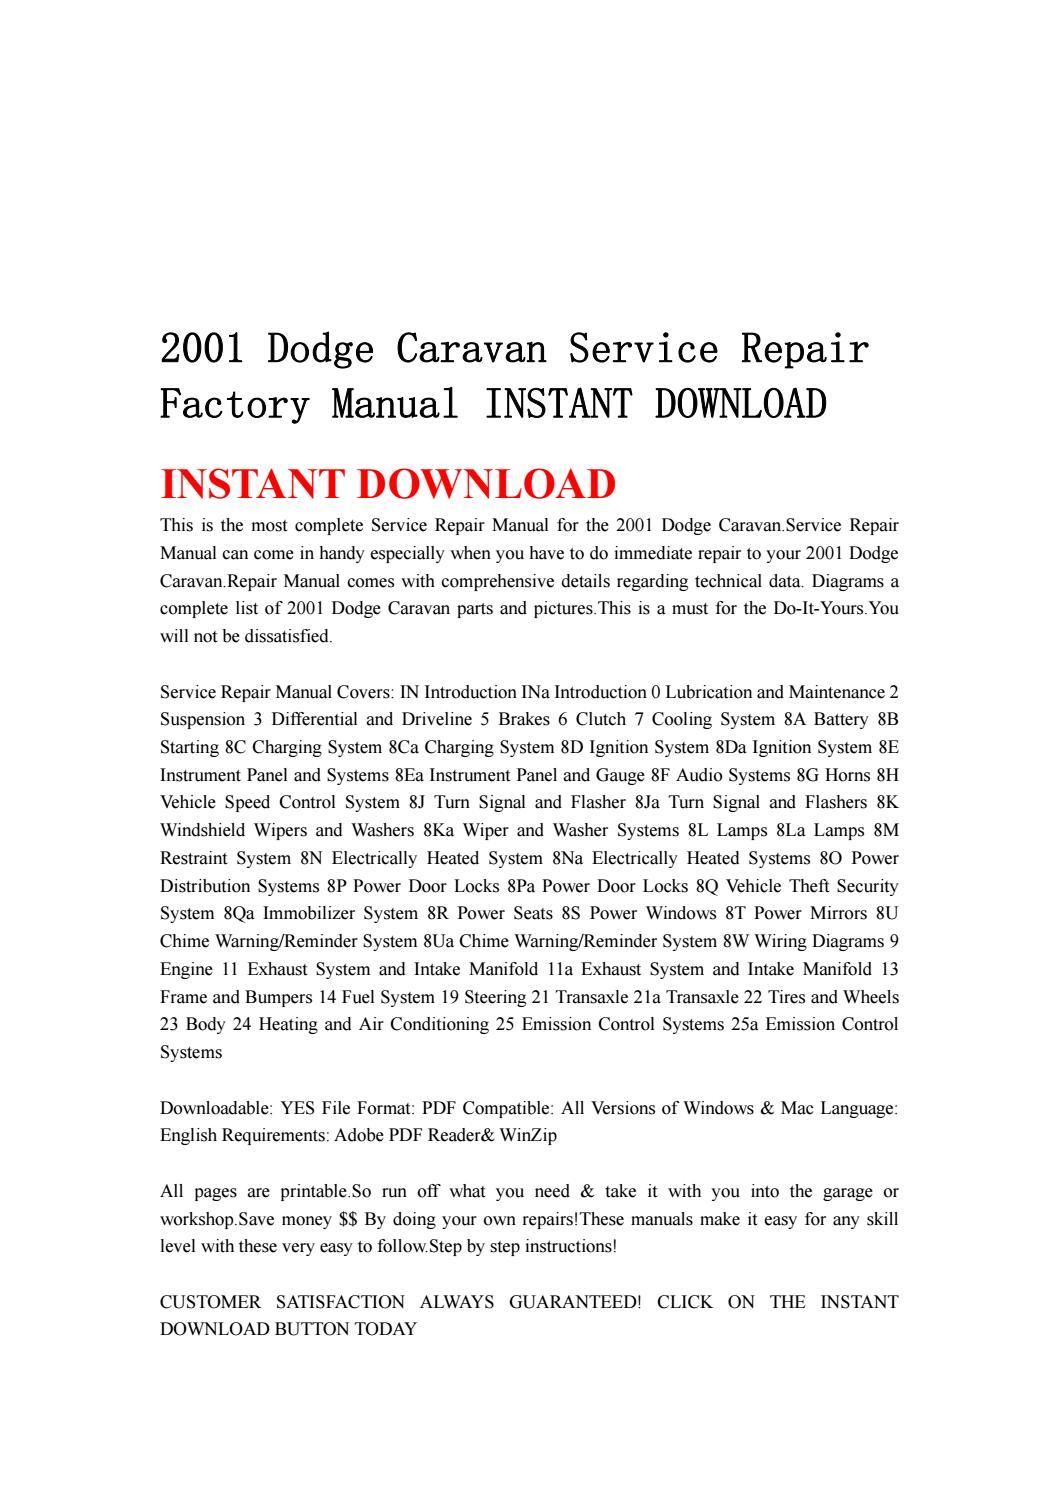 2001 dodge caravan service repair factory manual instant download by  kjjsemfmse - issuu